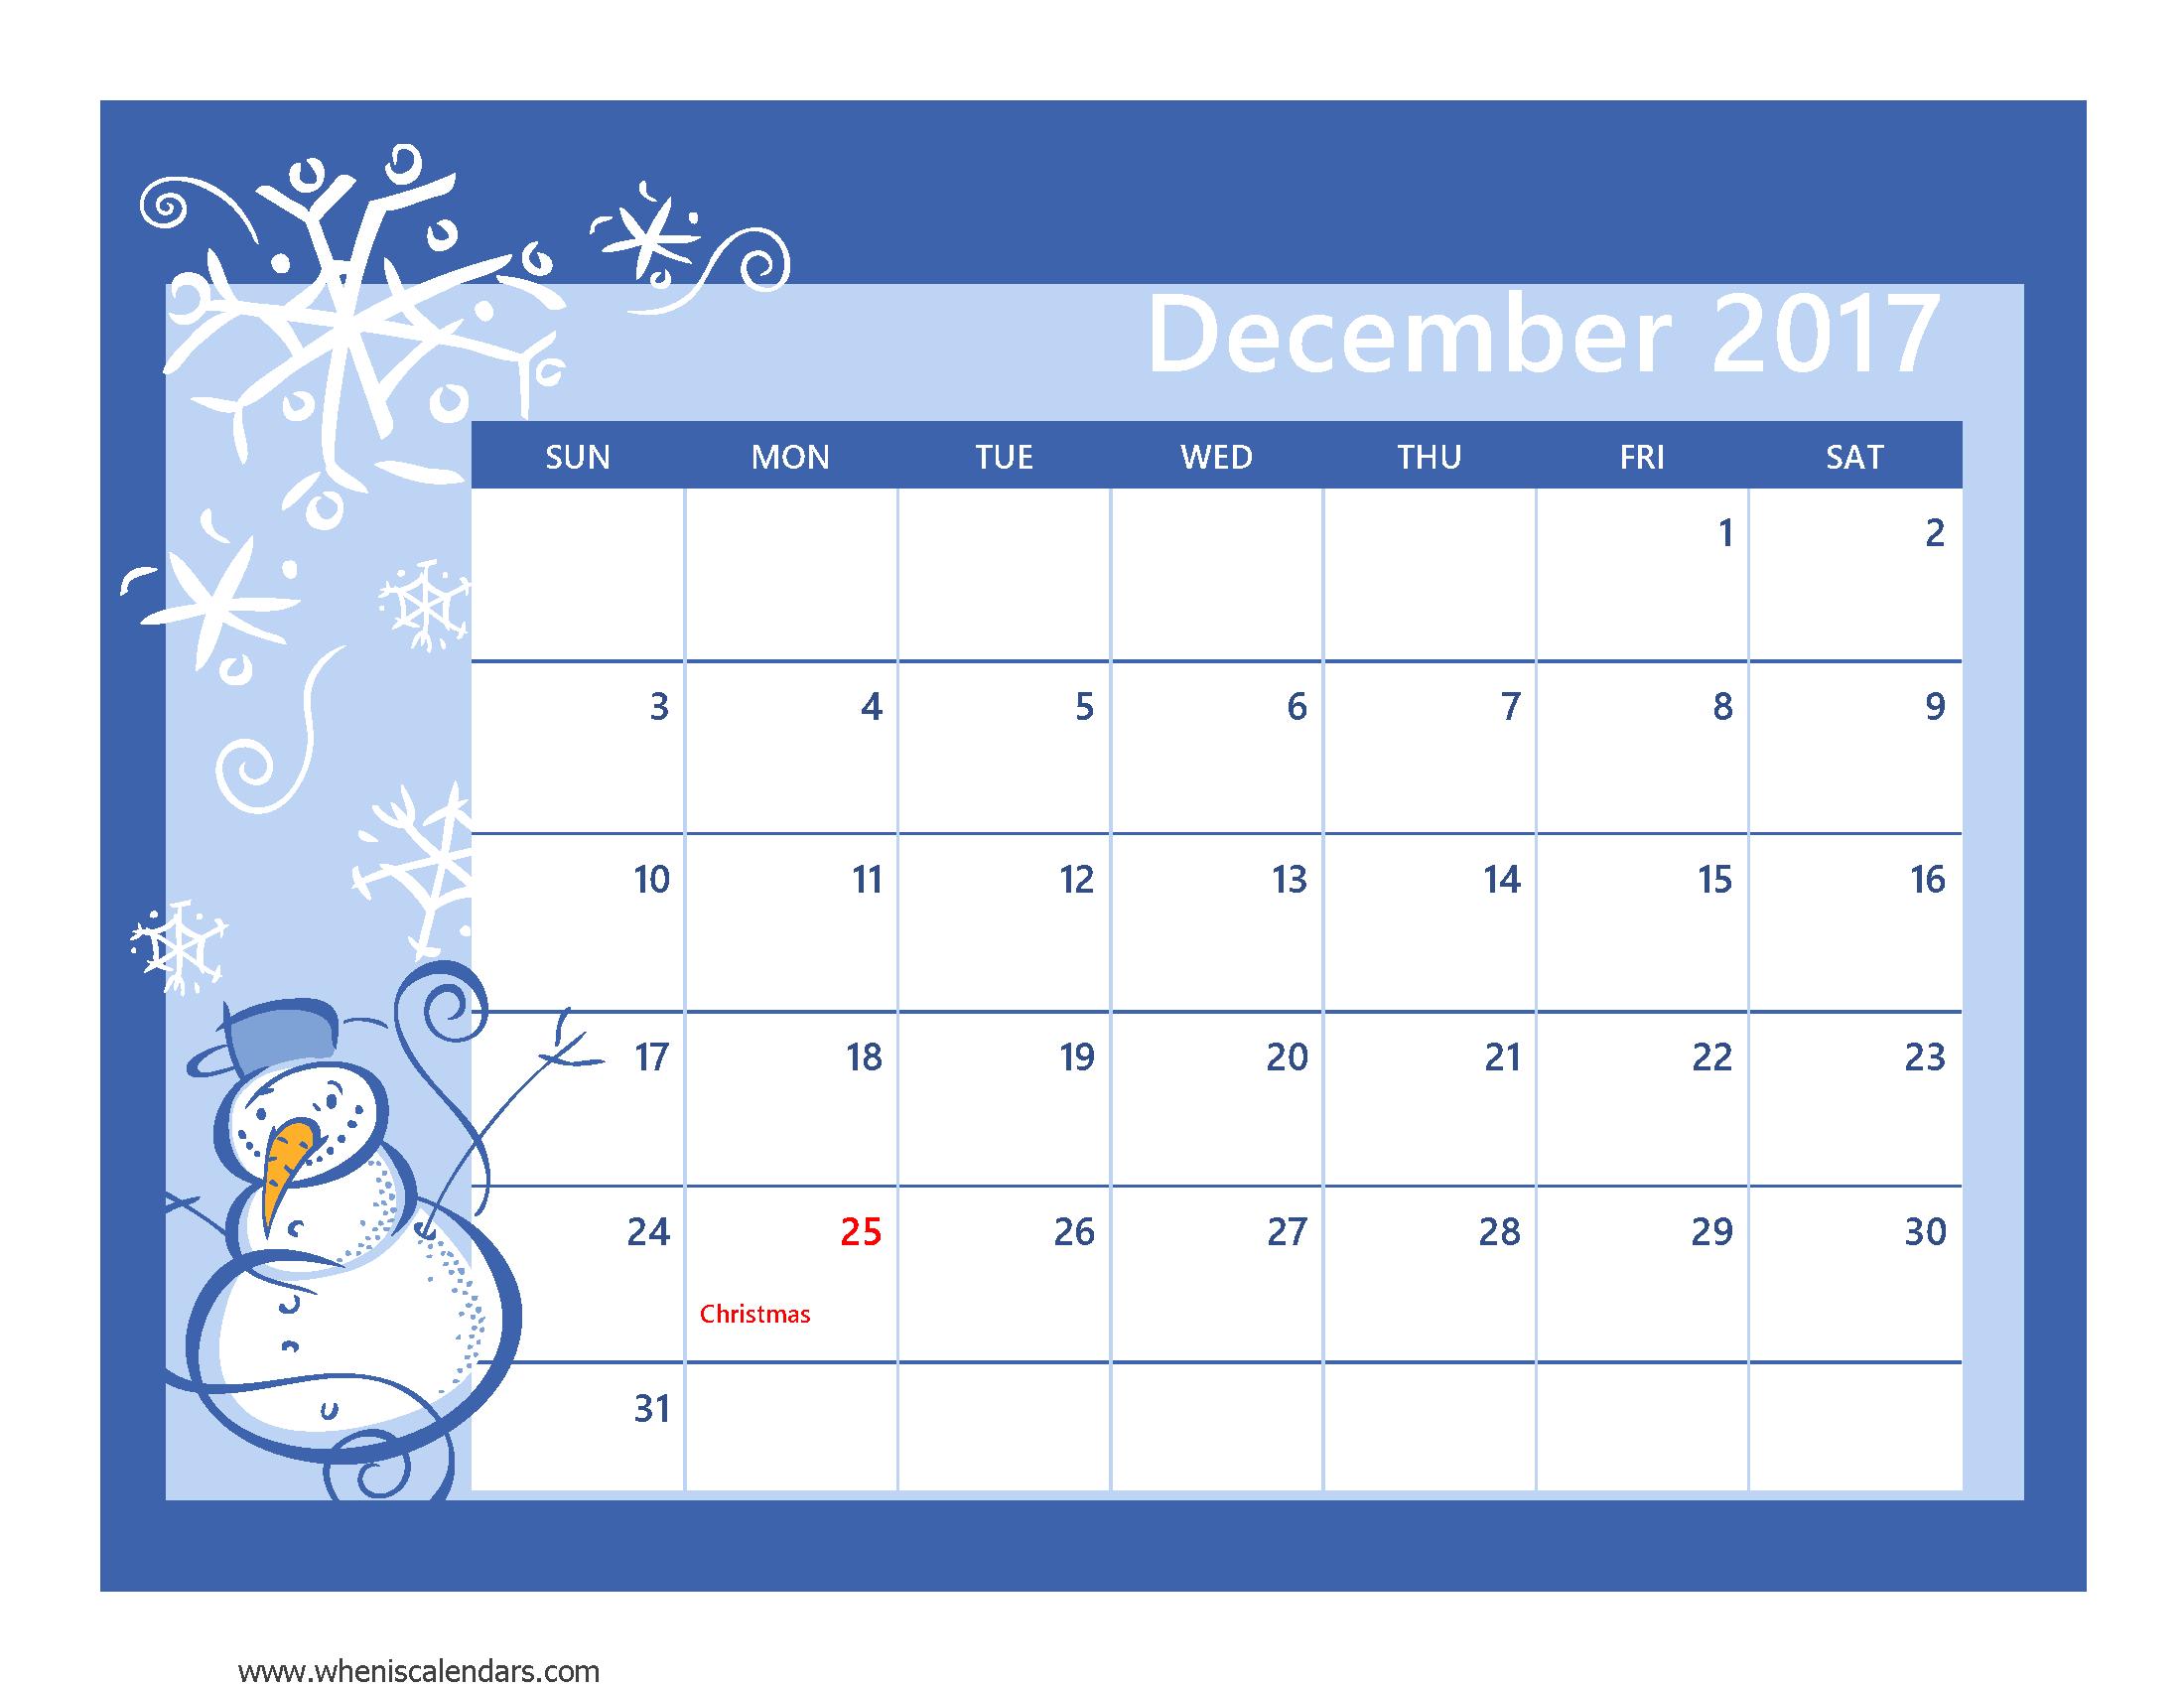 December 2017 Calendar Easter | 2017 calendar with holidays